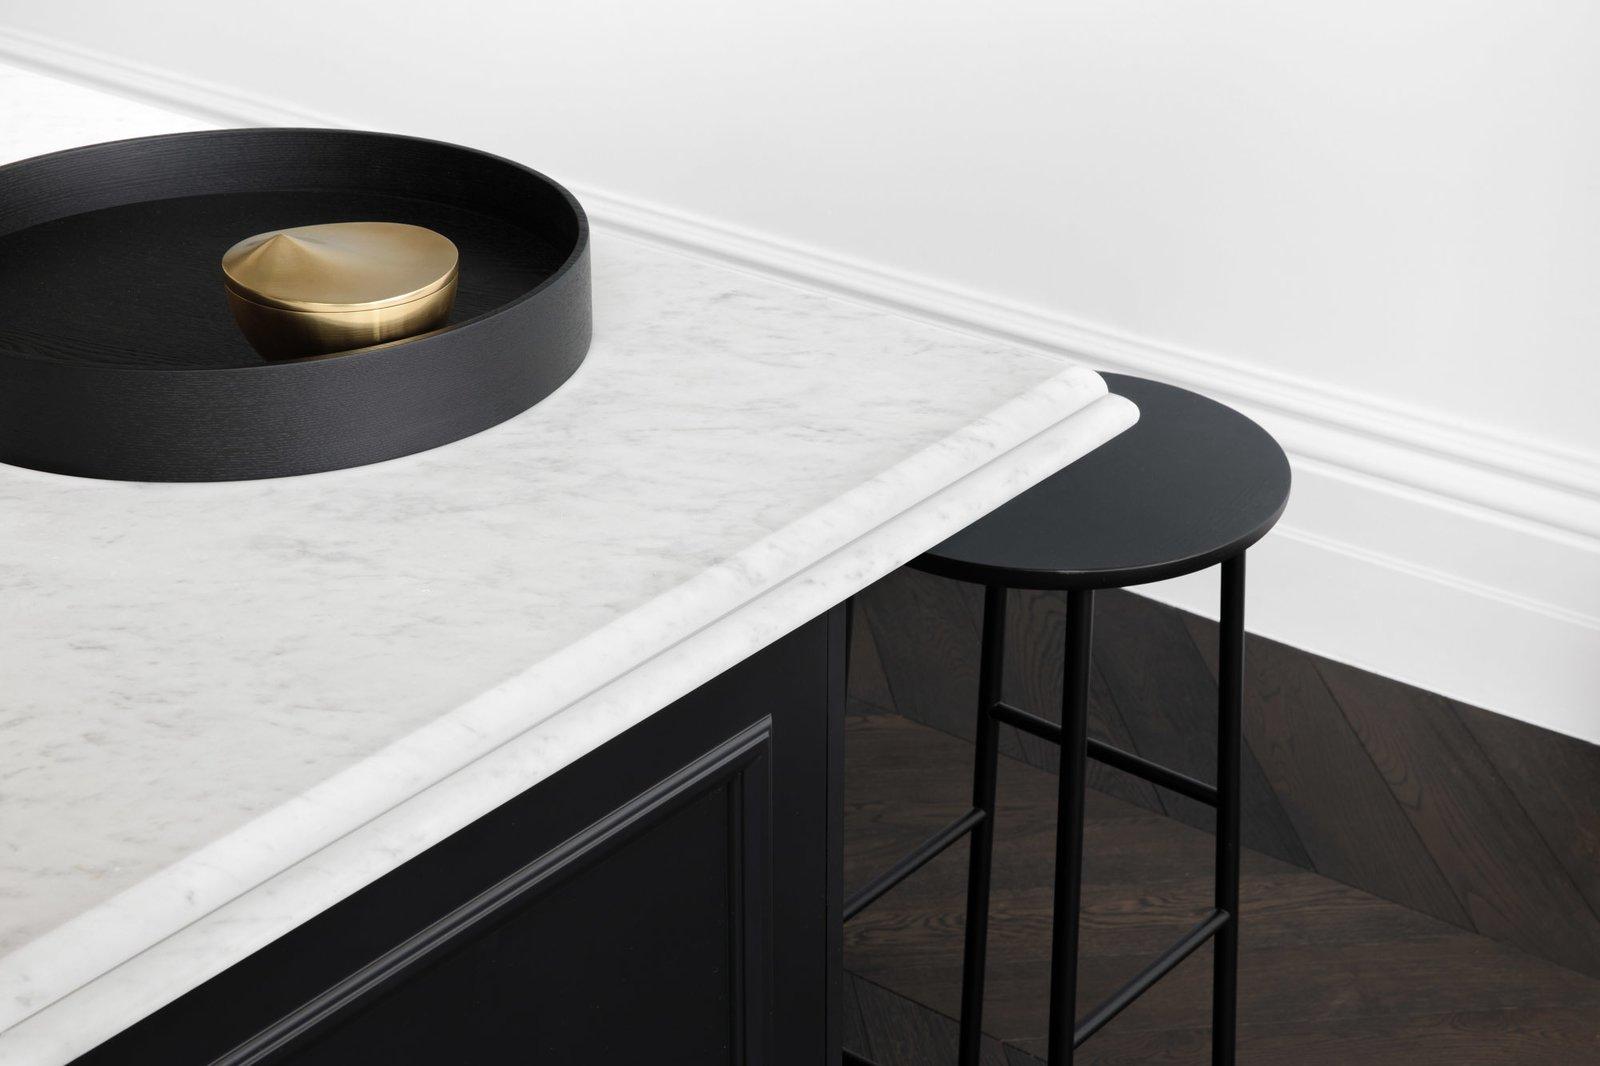 Kitchen, Marble Counter, Wood Cabinet, and Dark Hardwood Floor Kitchen details  Prahran Residence by Biasol